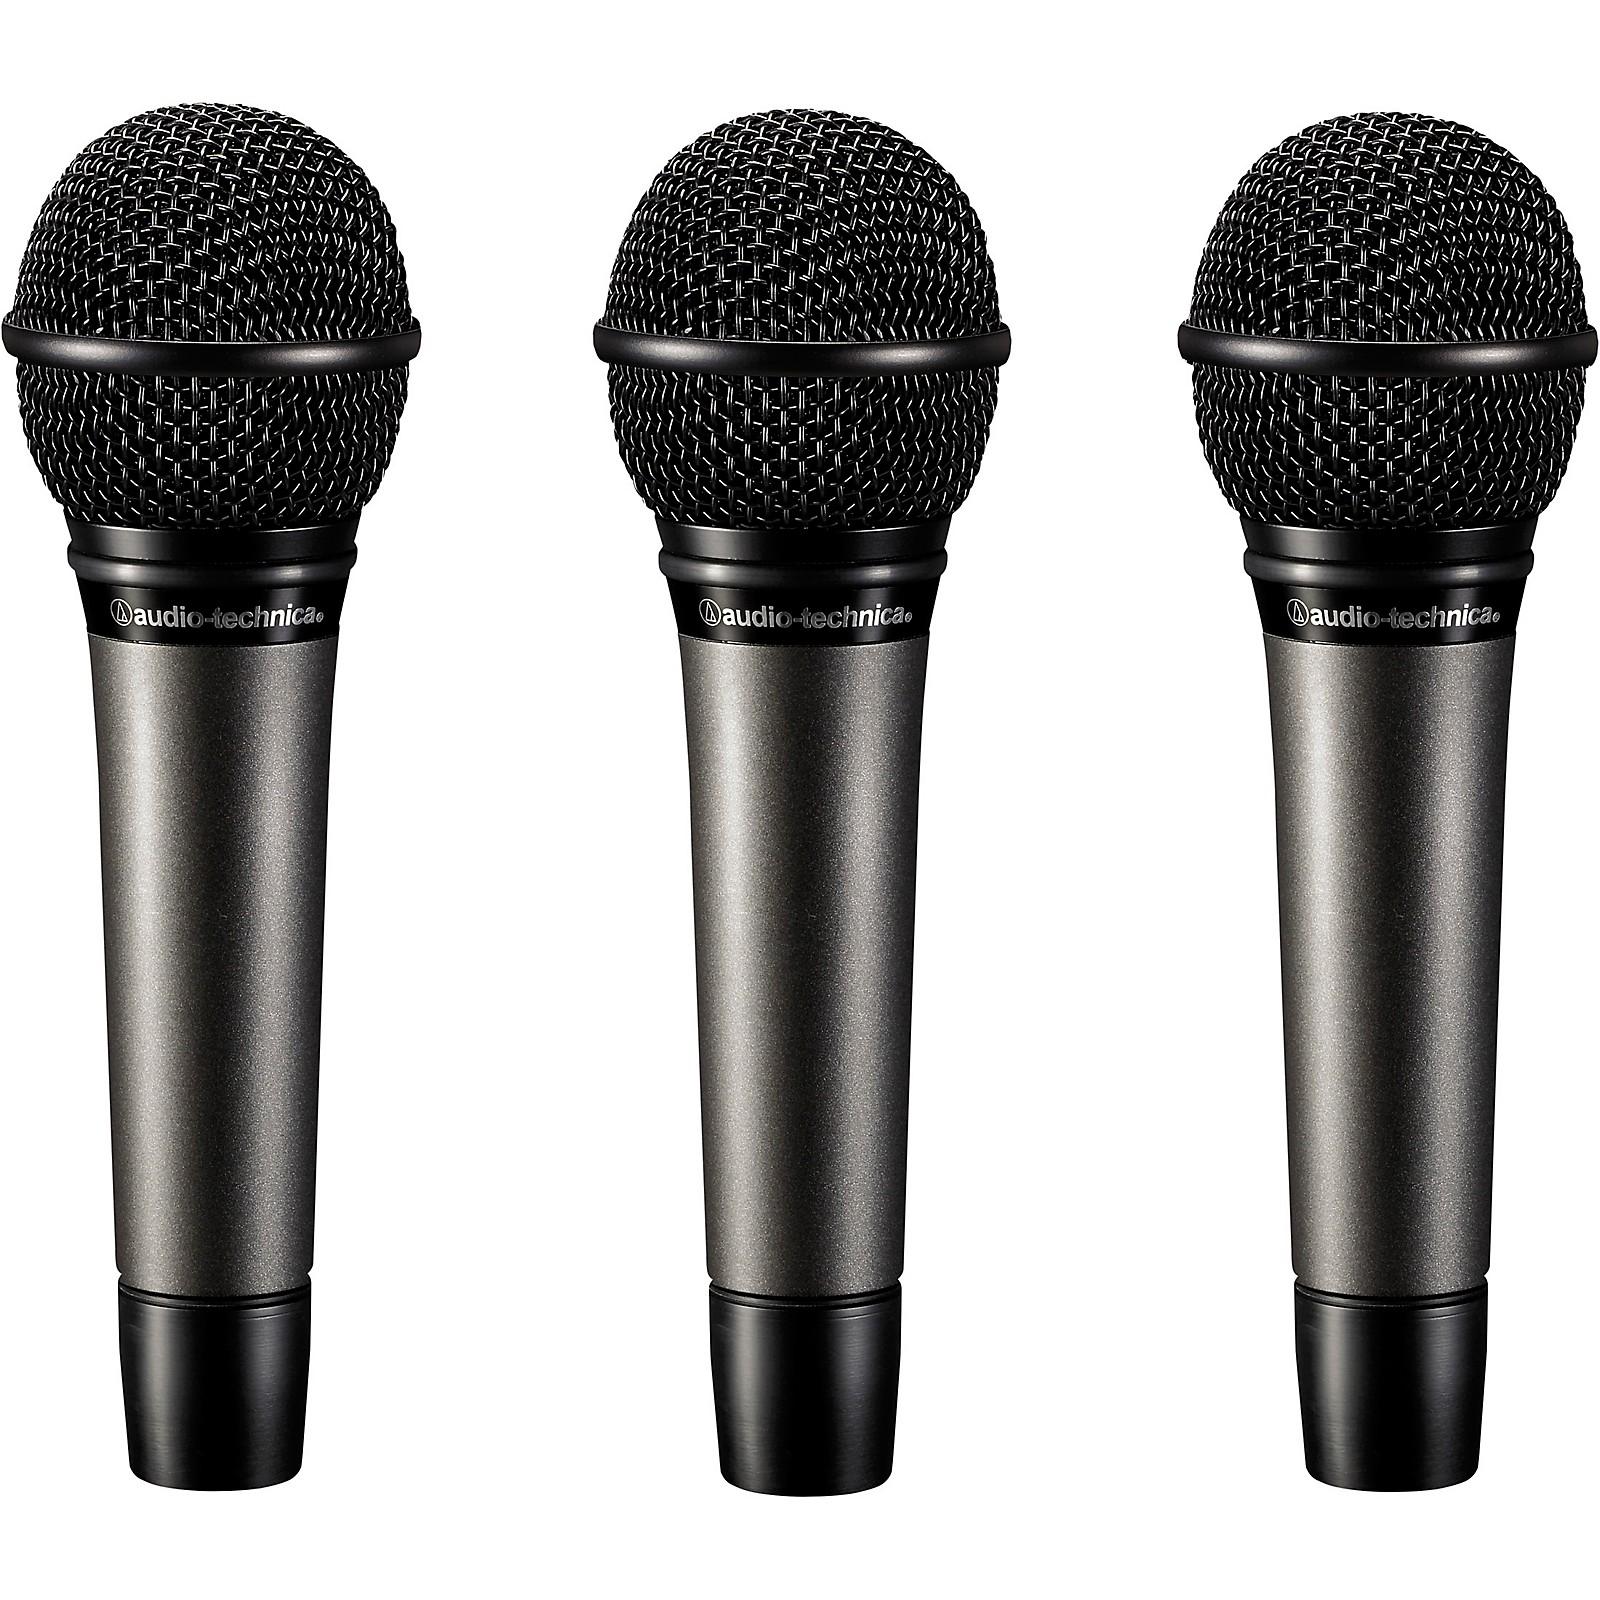 Audio-Technica ATM510 VOCAL PACK - 3 PIECE